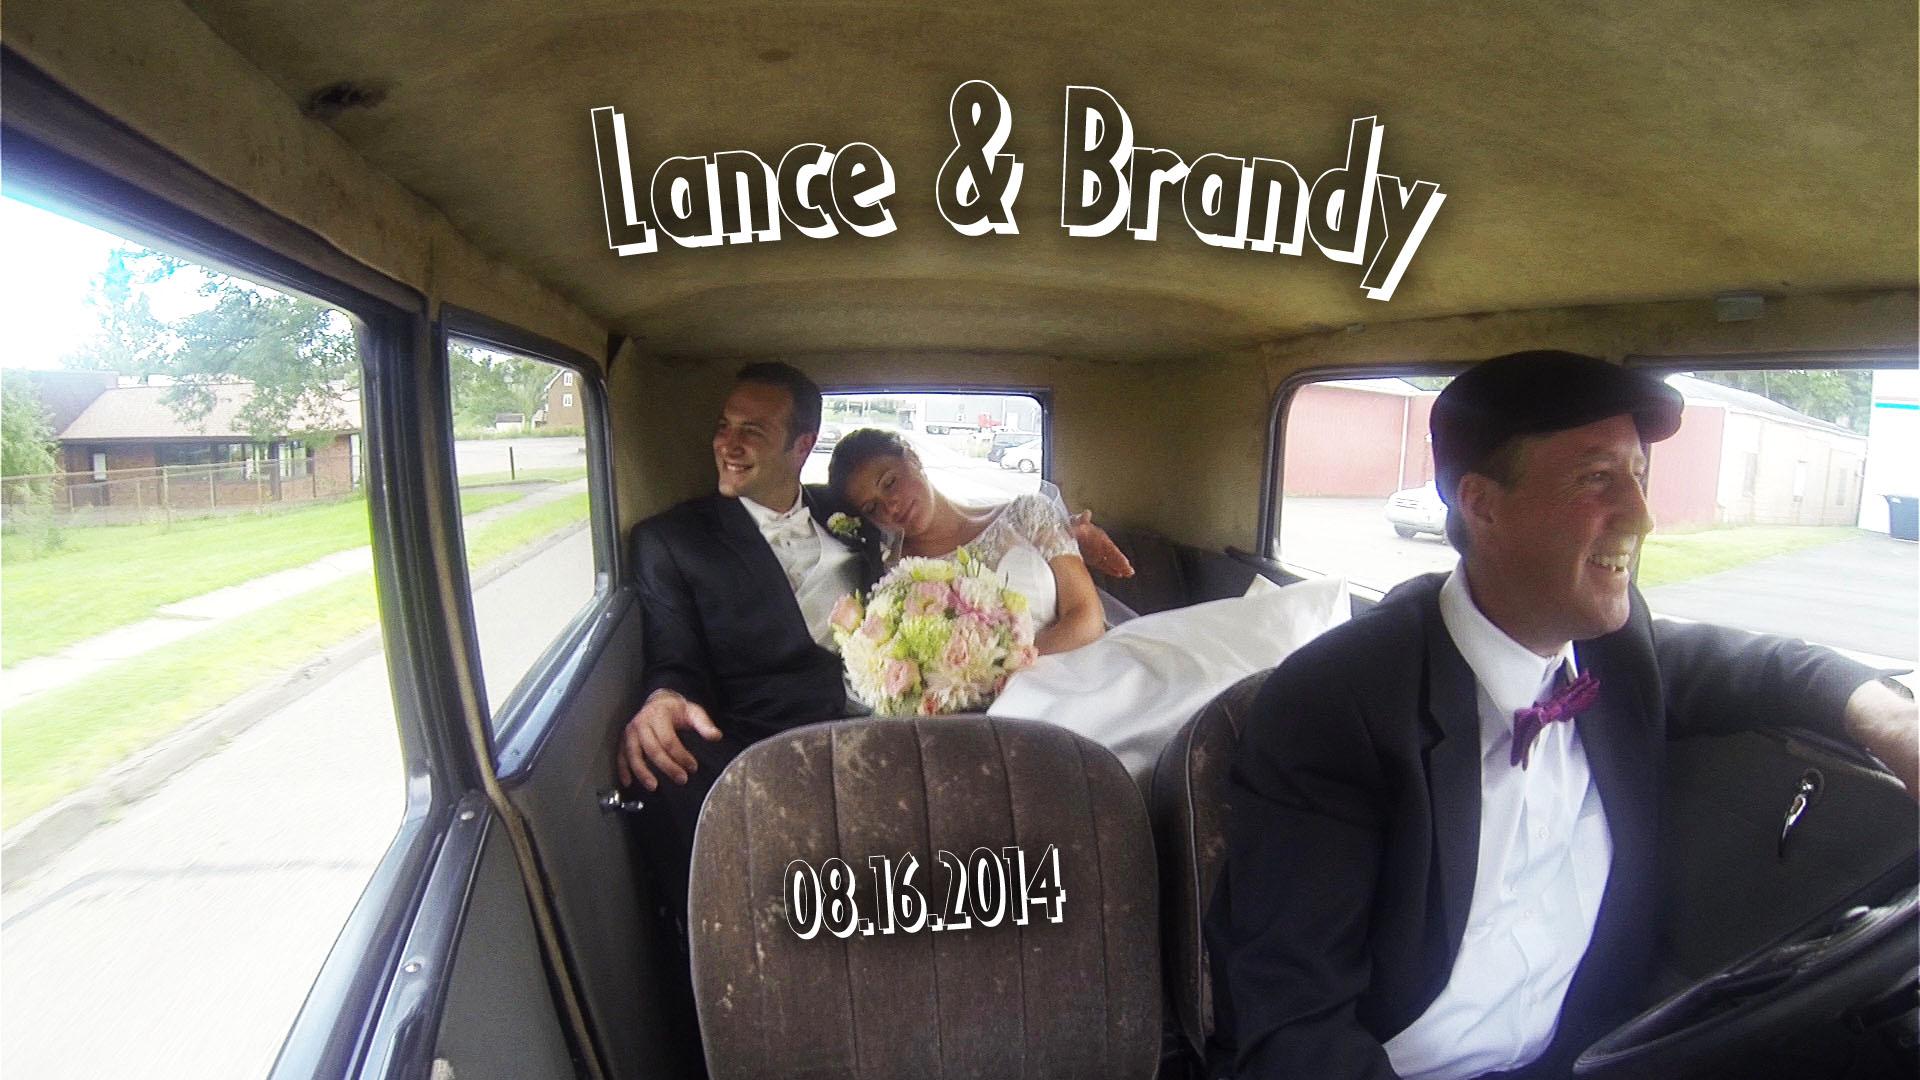 Lance & Brandy – Kane, PA Wedding Video